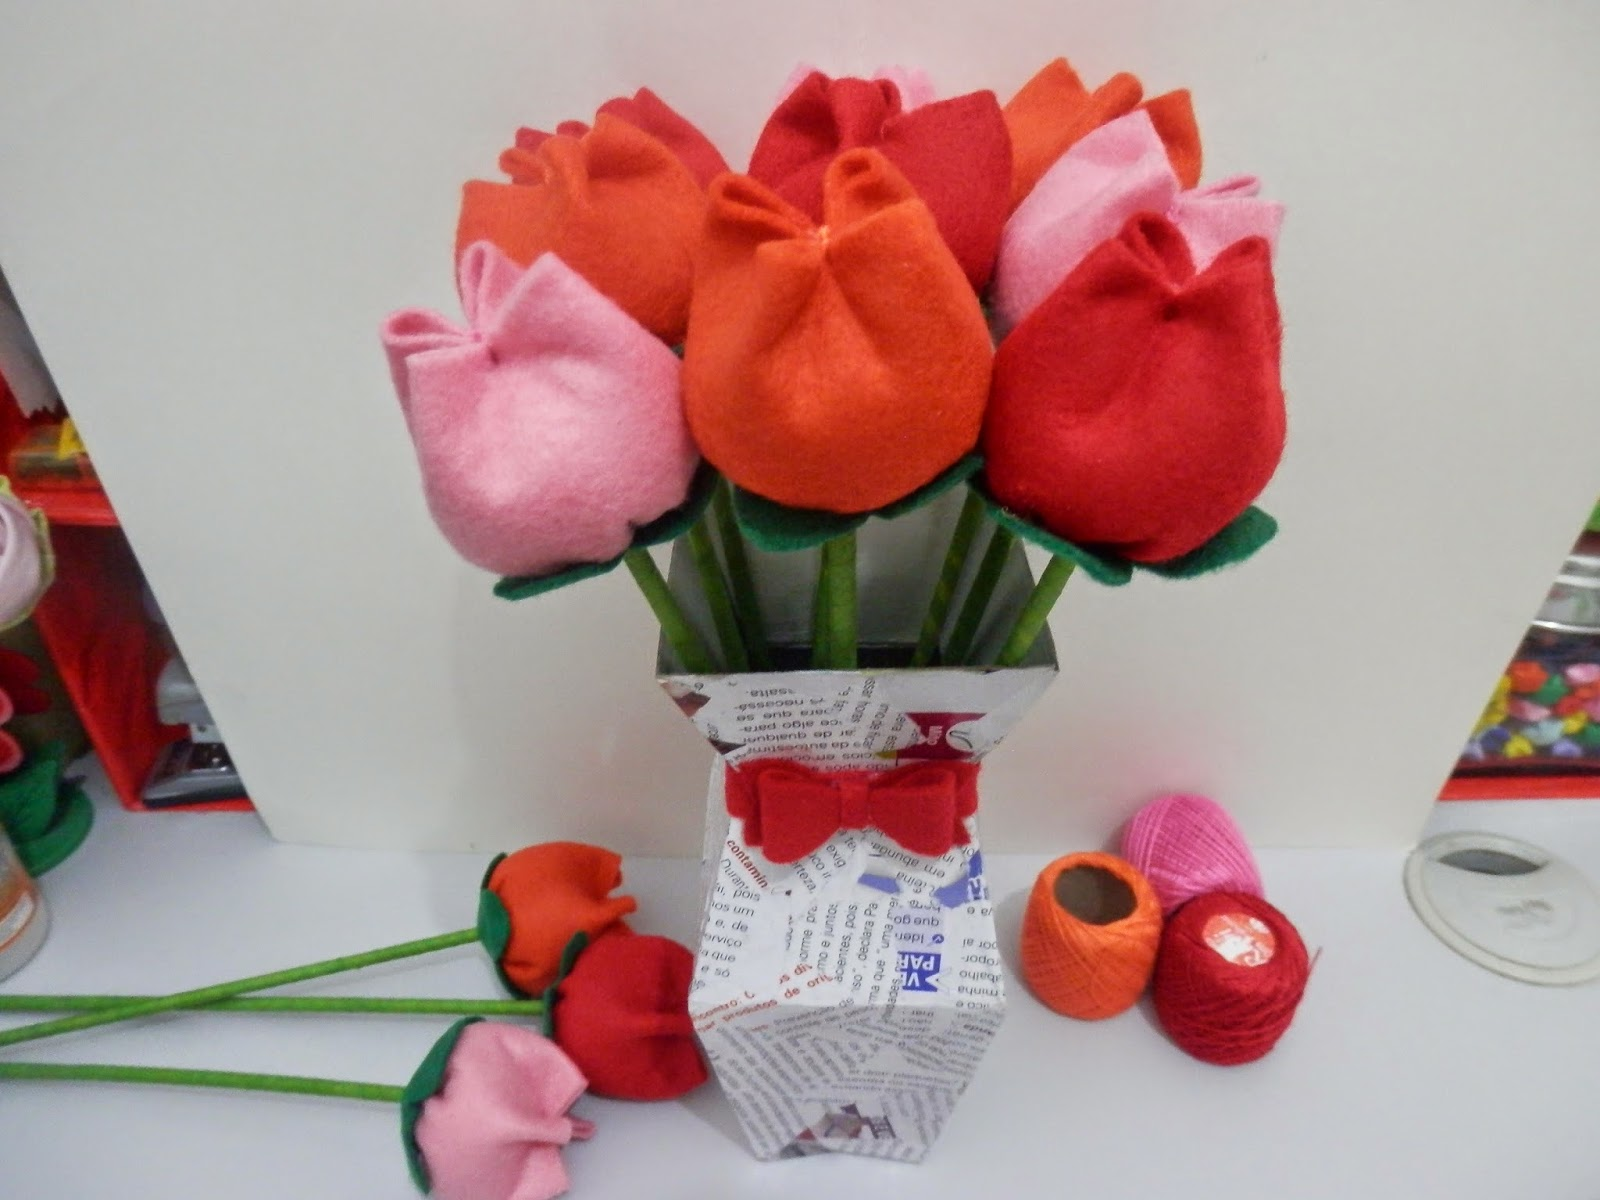 Artesanato Zezinha ~ alinne's world Tulipa Artesanato passo a passo